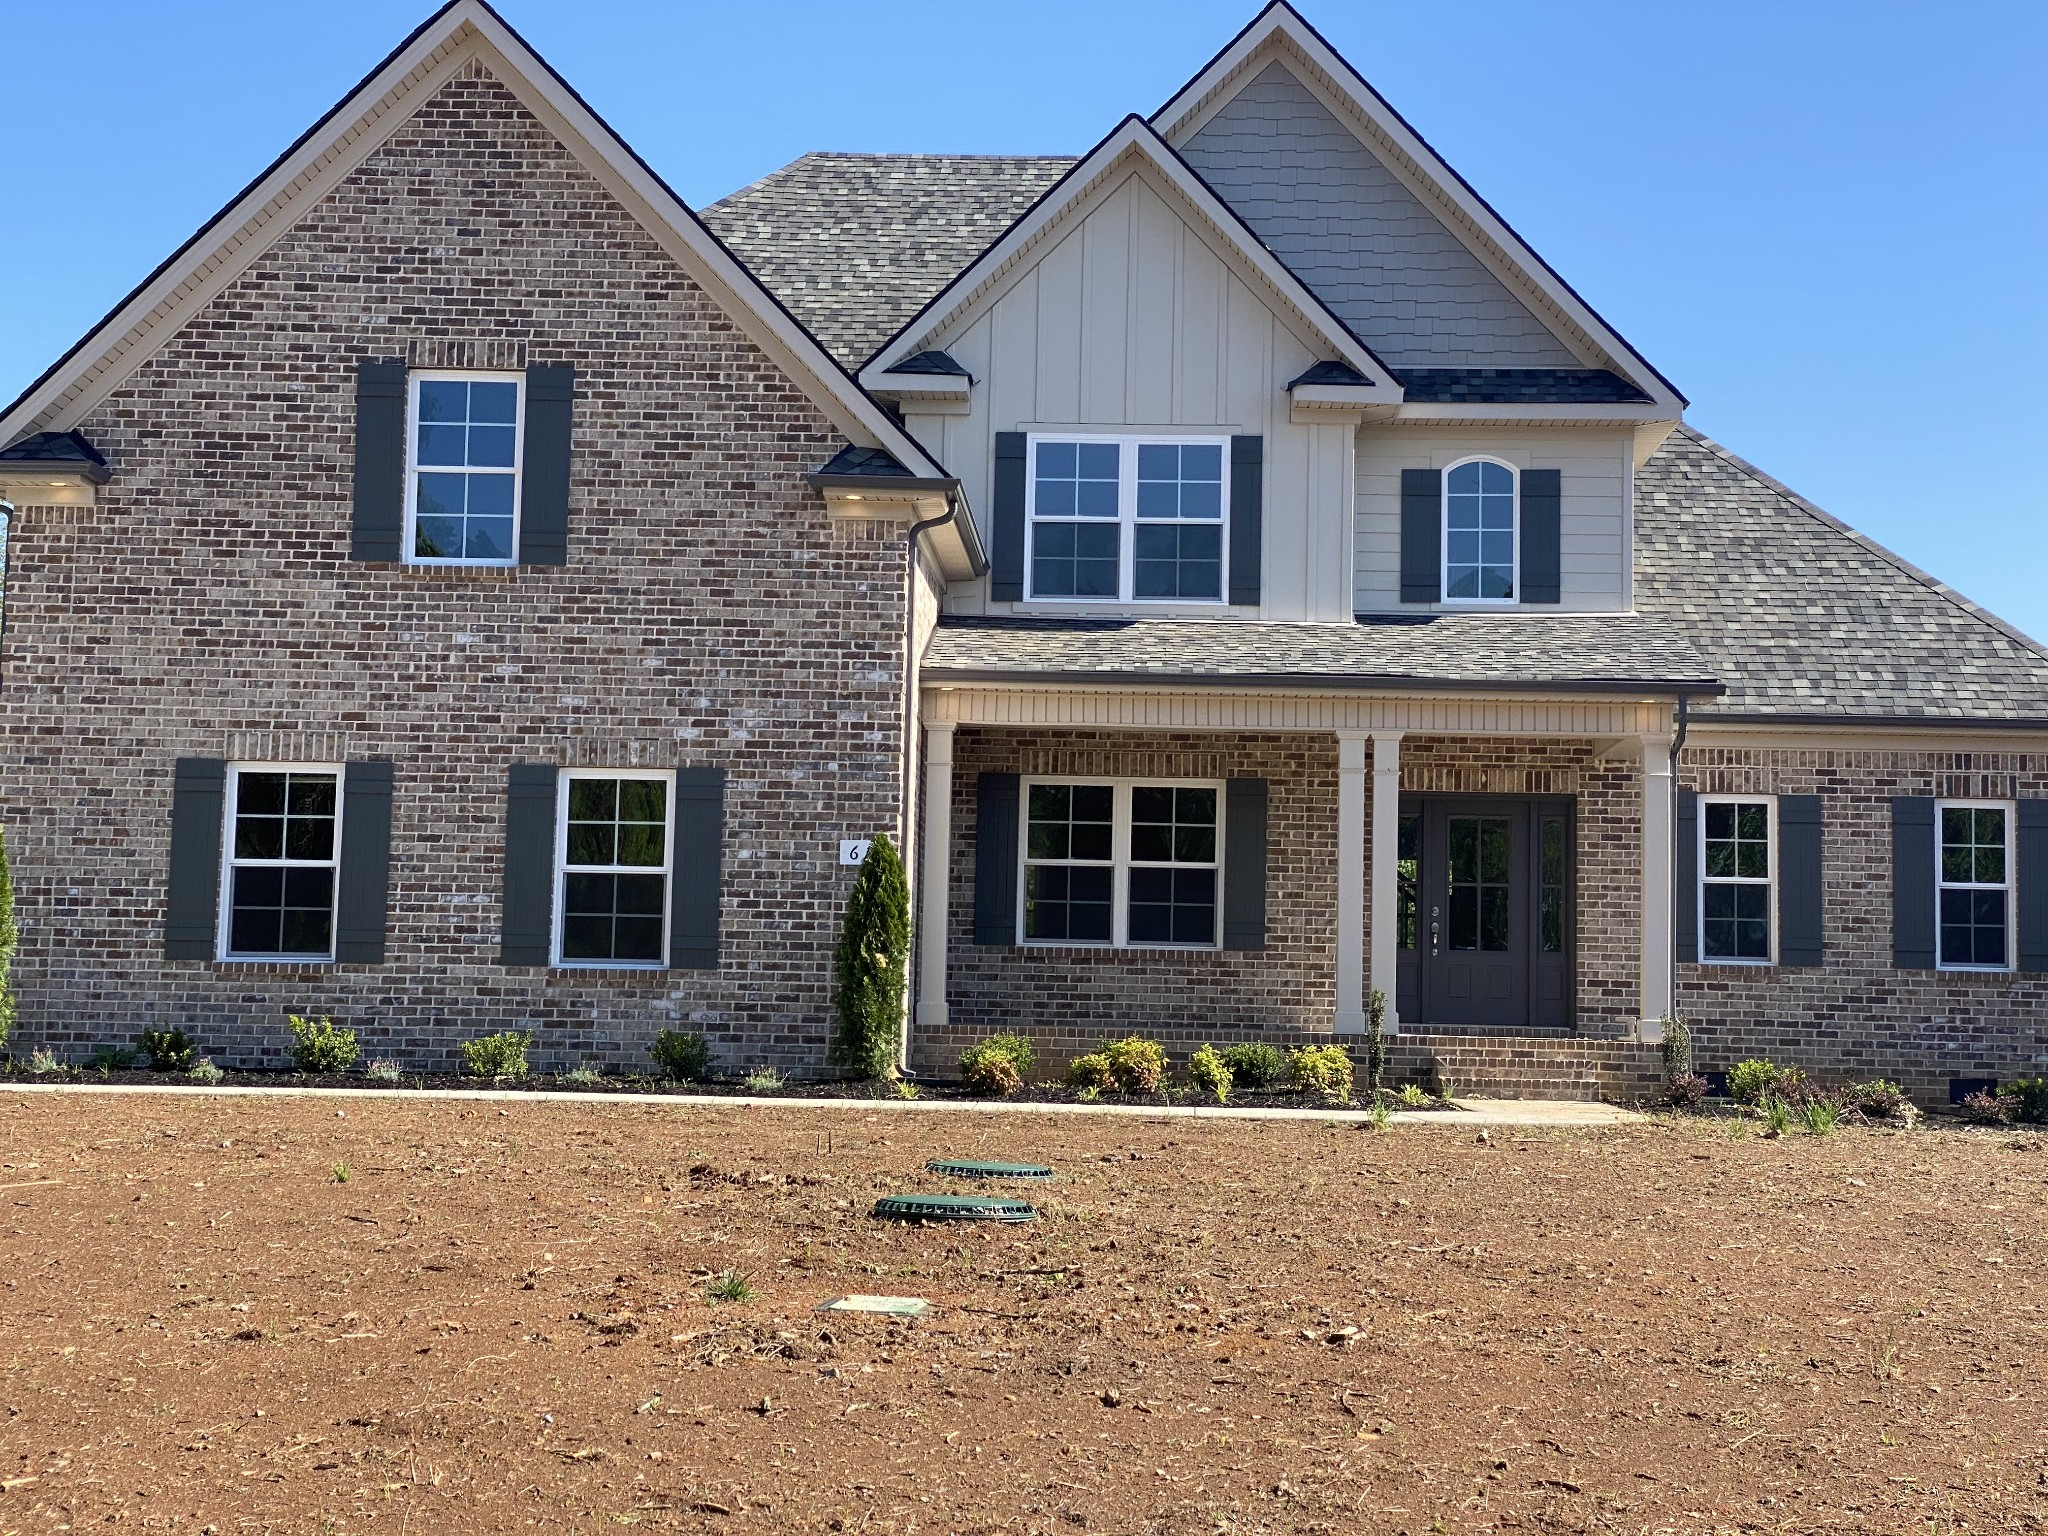 614 Ruby Oaks Lane, Murfreesboro, TN 37128 - Murfreesboro, TN real estate listing